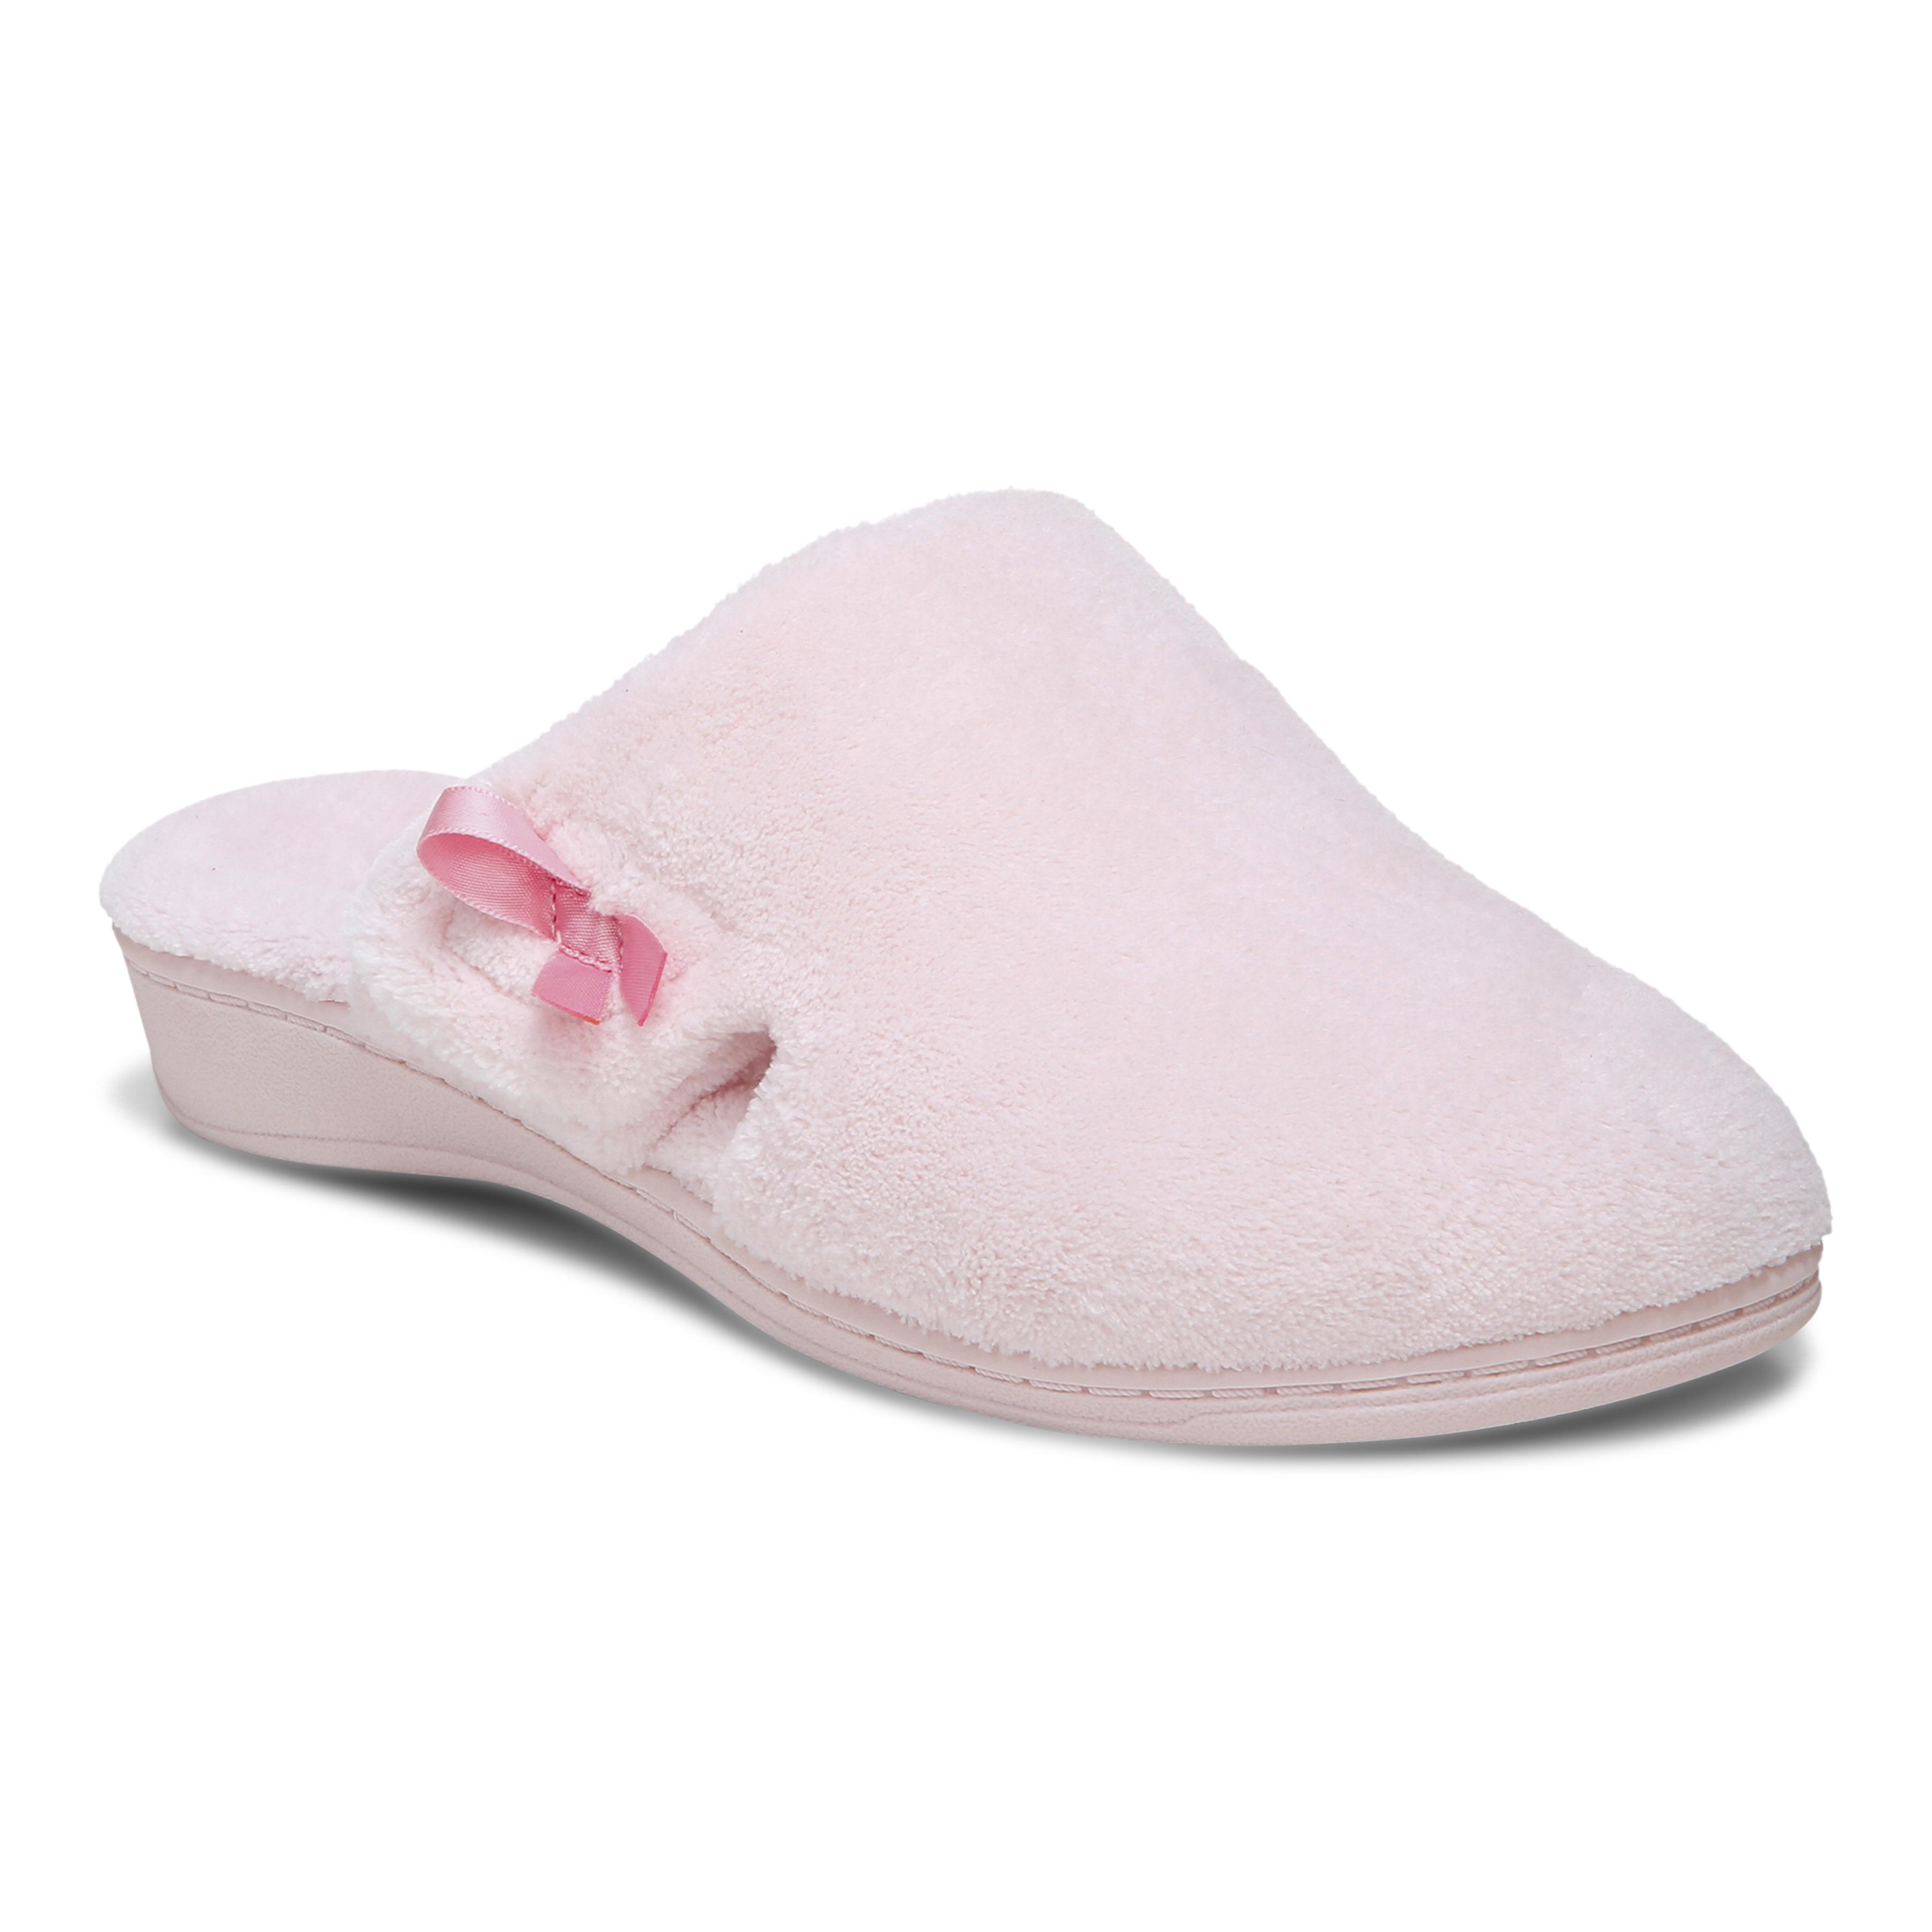 Breast Cancer Awareness Exclusive Gemma Cameo Pink_227a5d6a.jpg